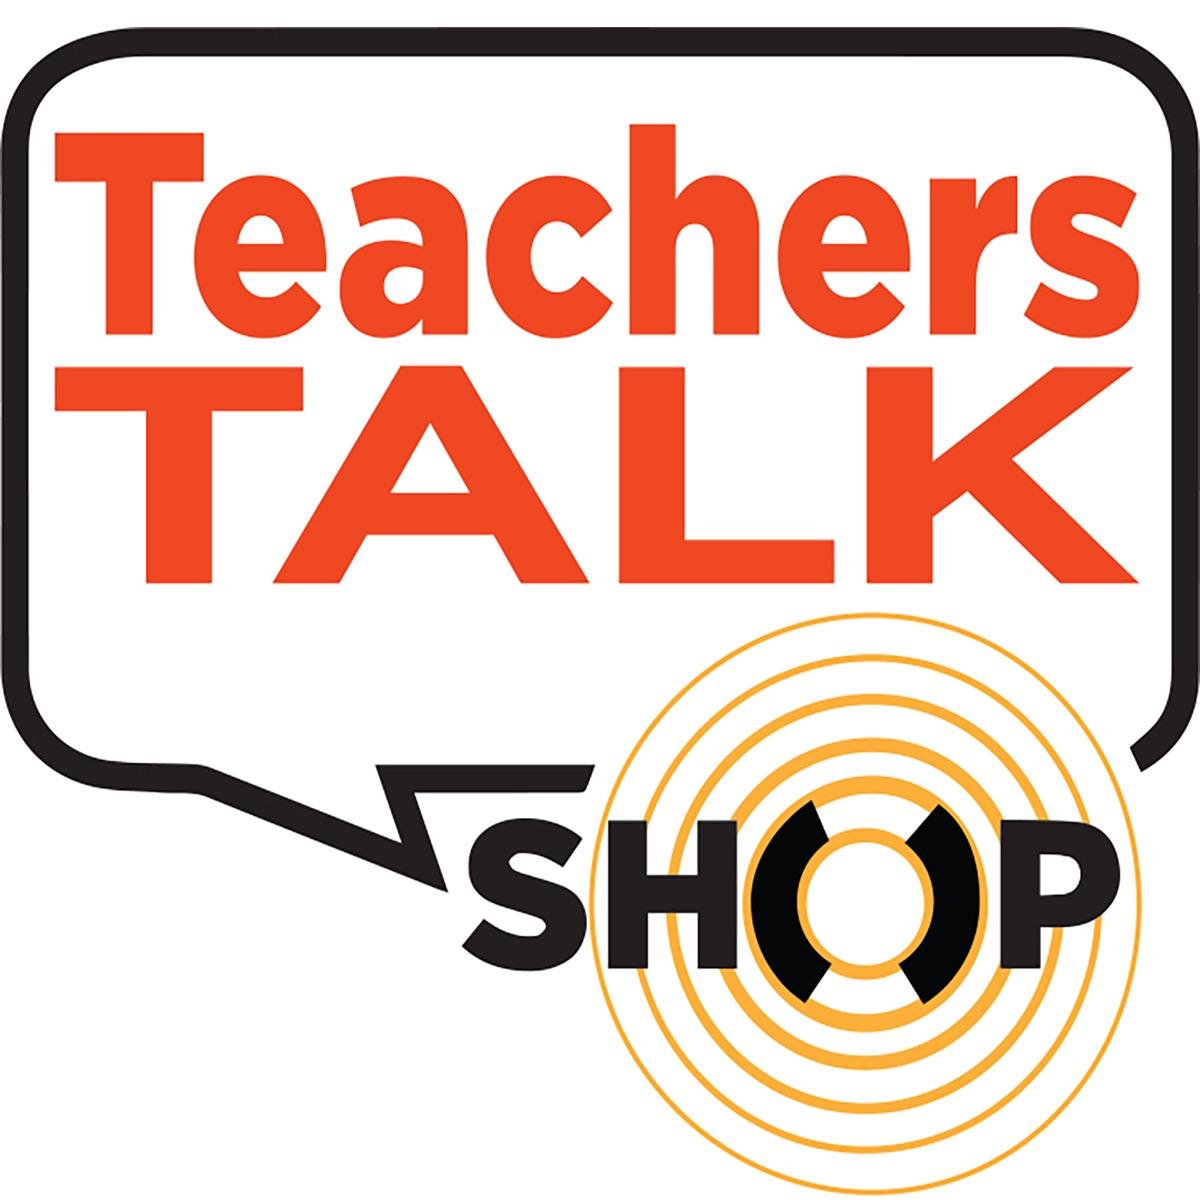 The Teachers Talk Shop Podcast